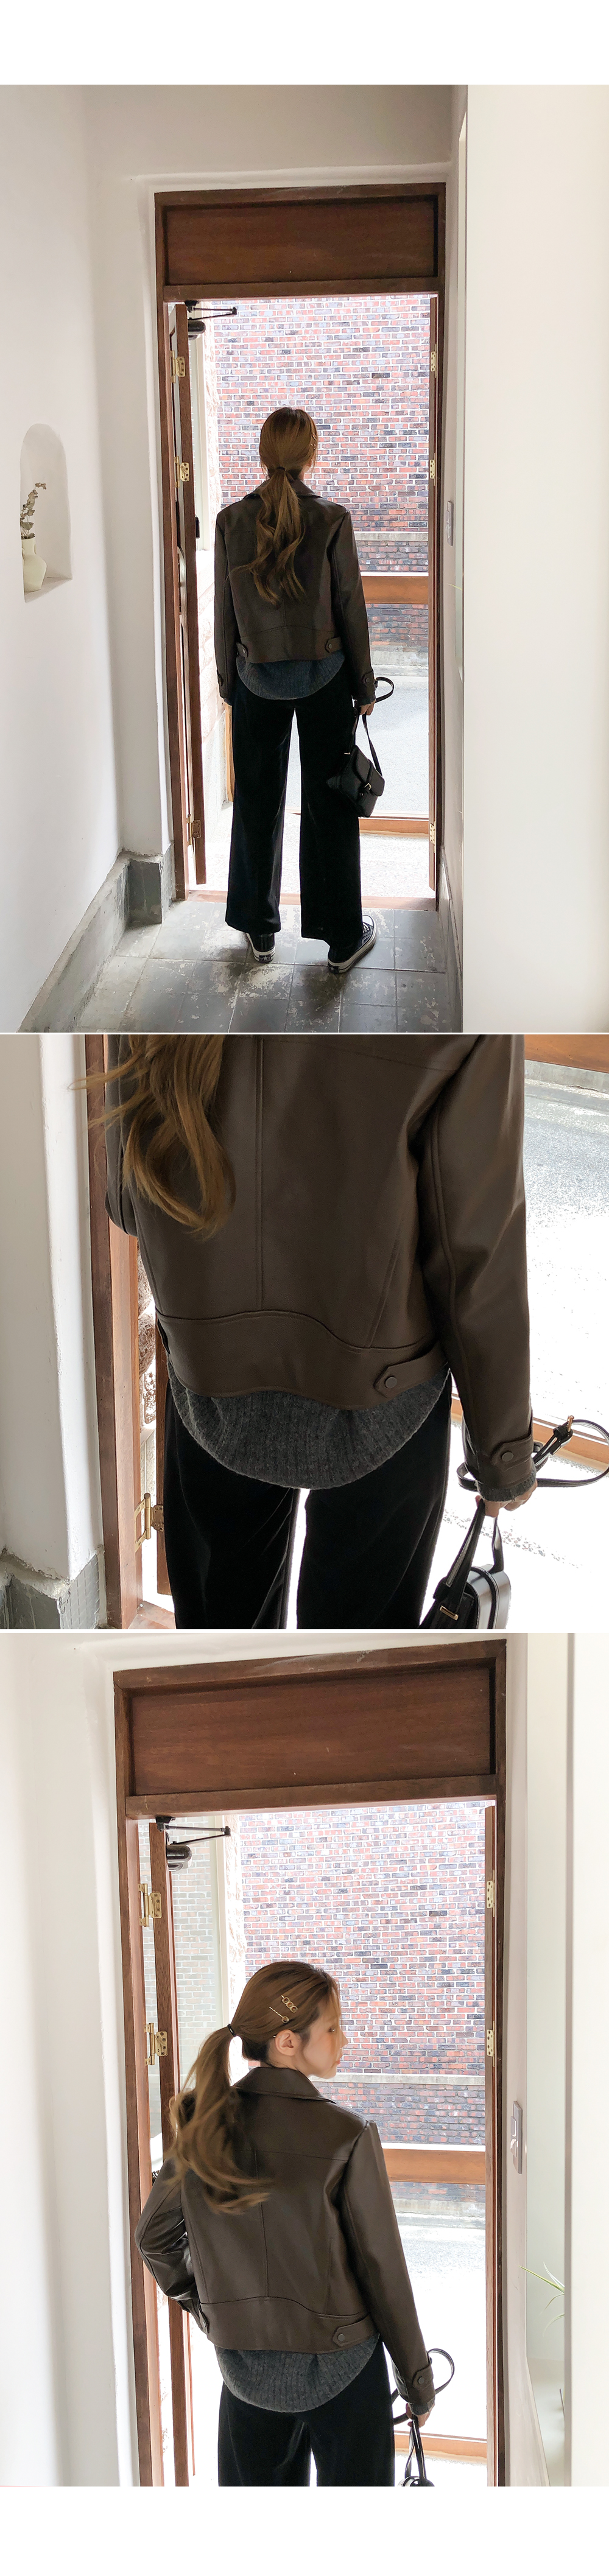 Warm knit cardigan